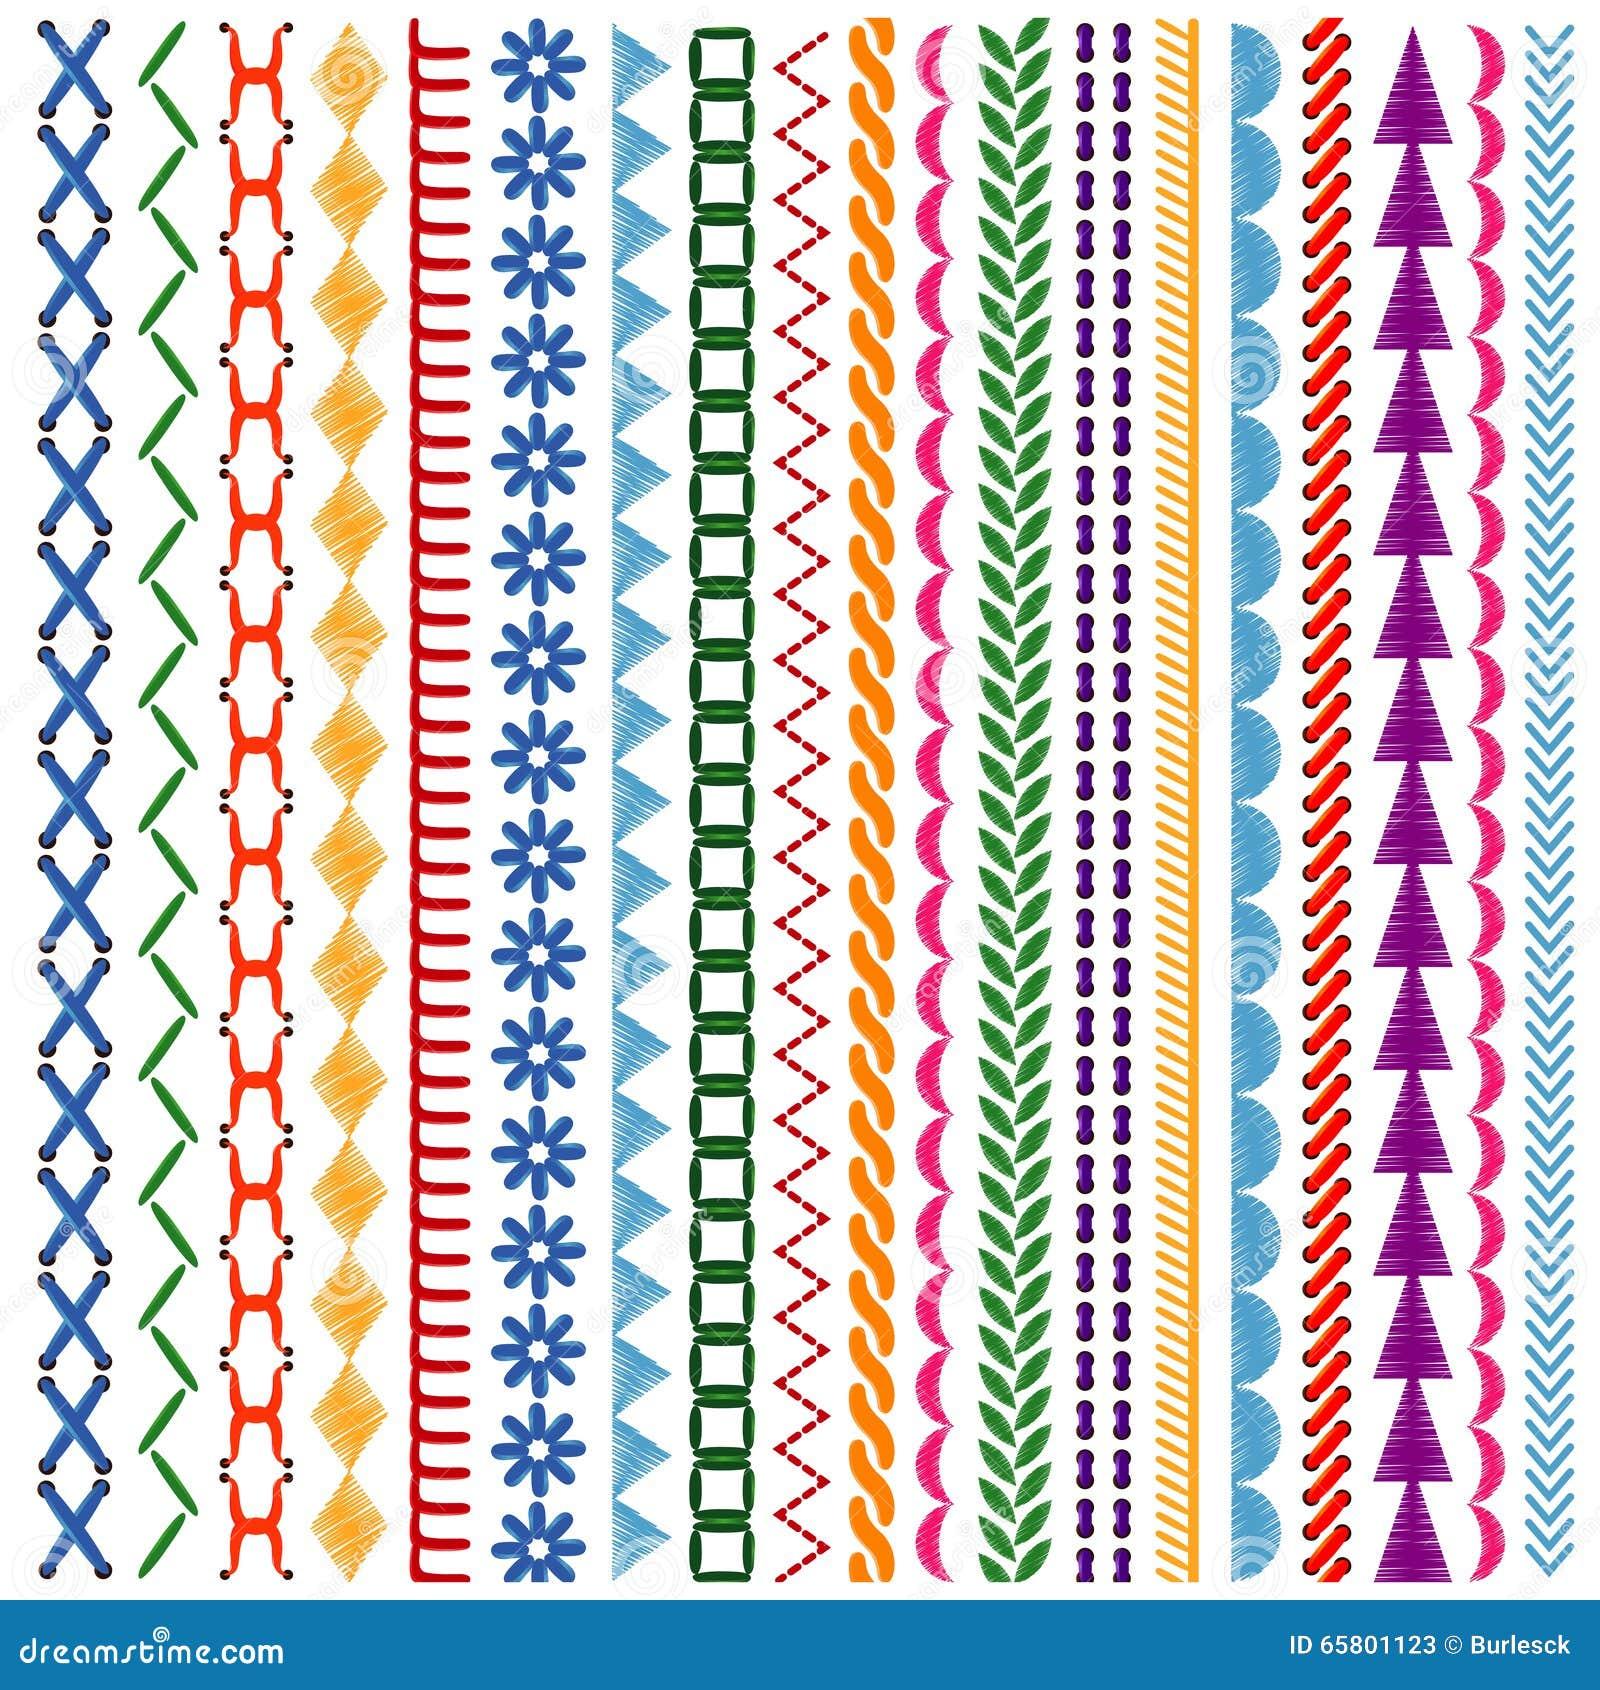 Embroidery stitches vector makaroka